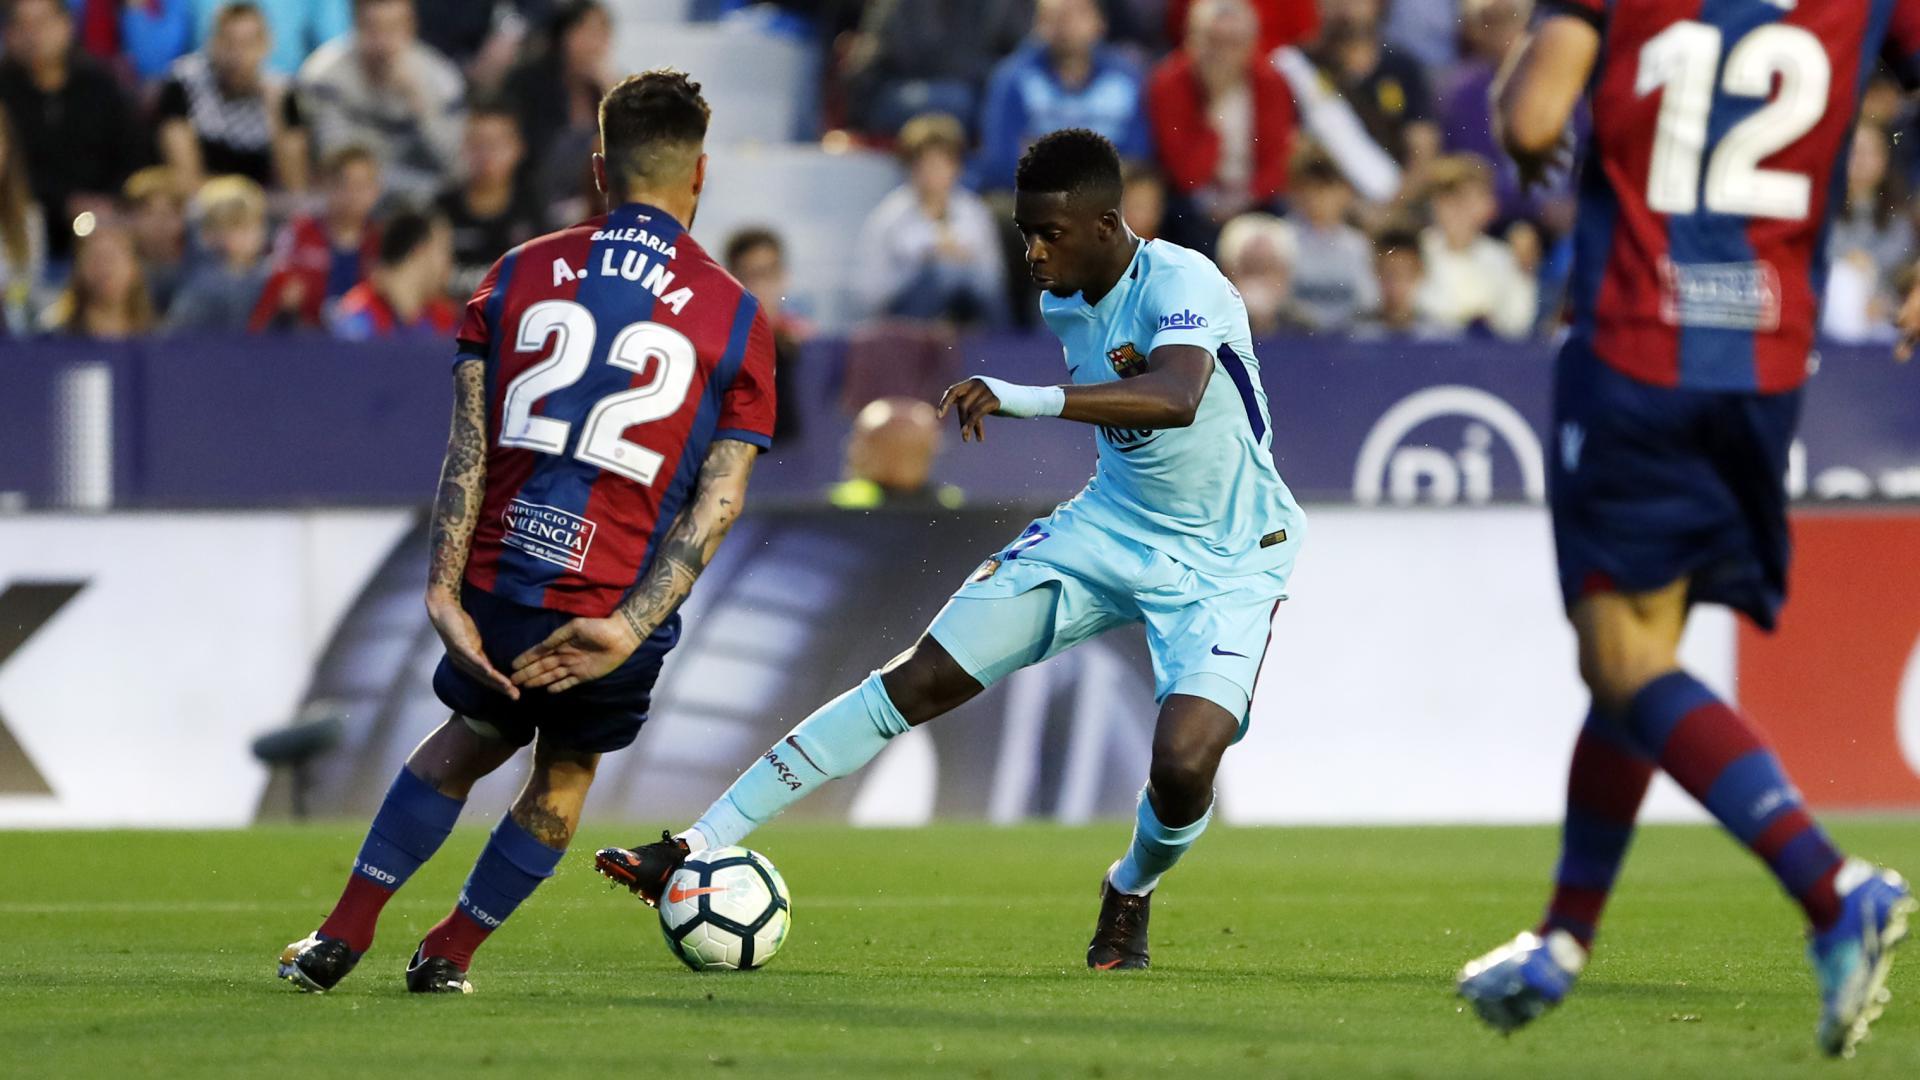 �� 60: Double change for Barça. Alcácer and Denis on for Iniesta and Dembélé #LevanteBarça https://t.co/o1Kch5dUBD